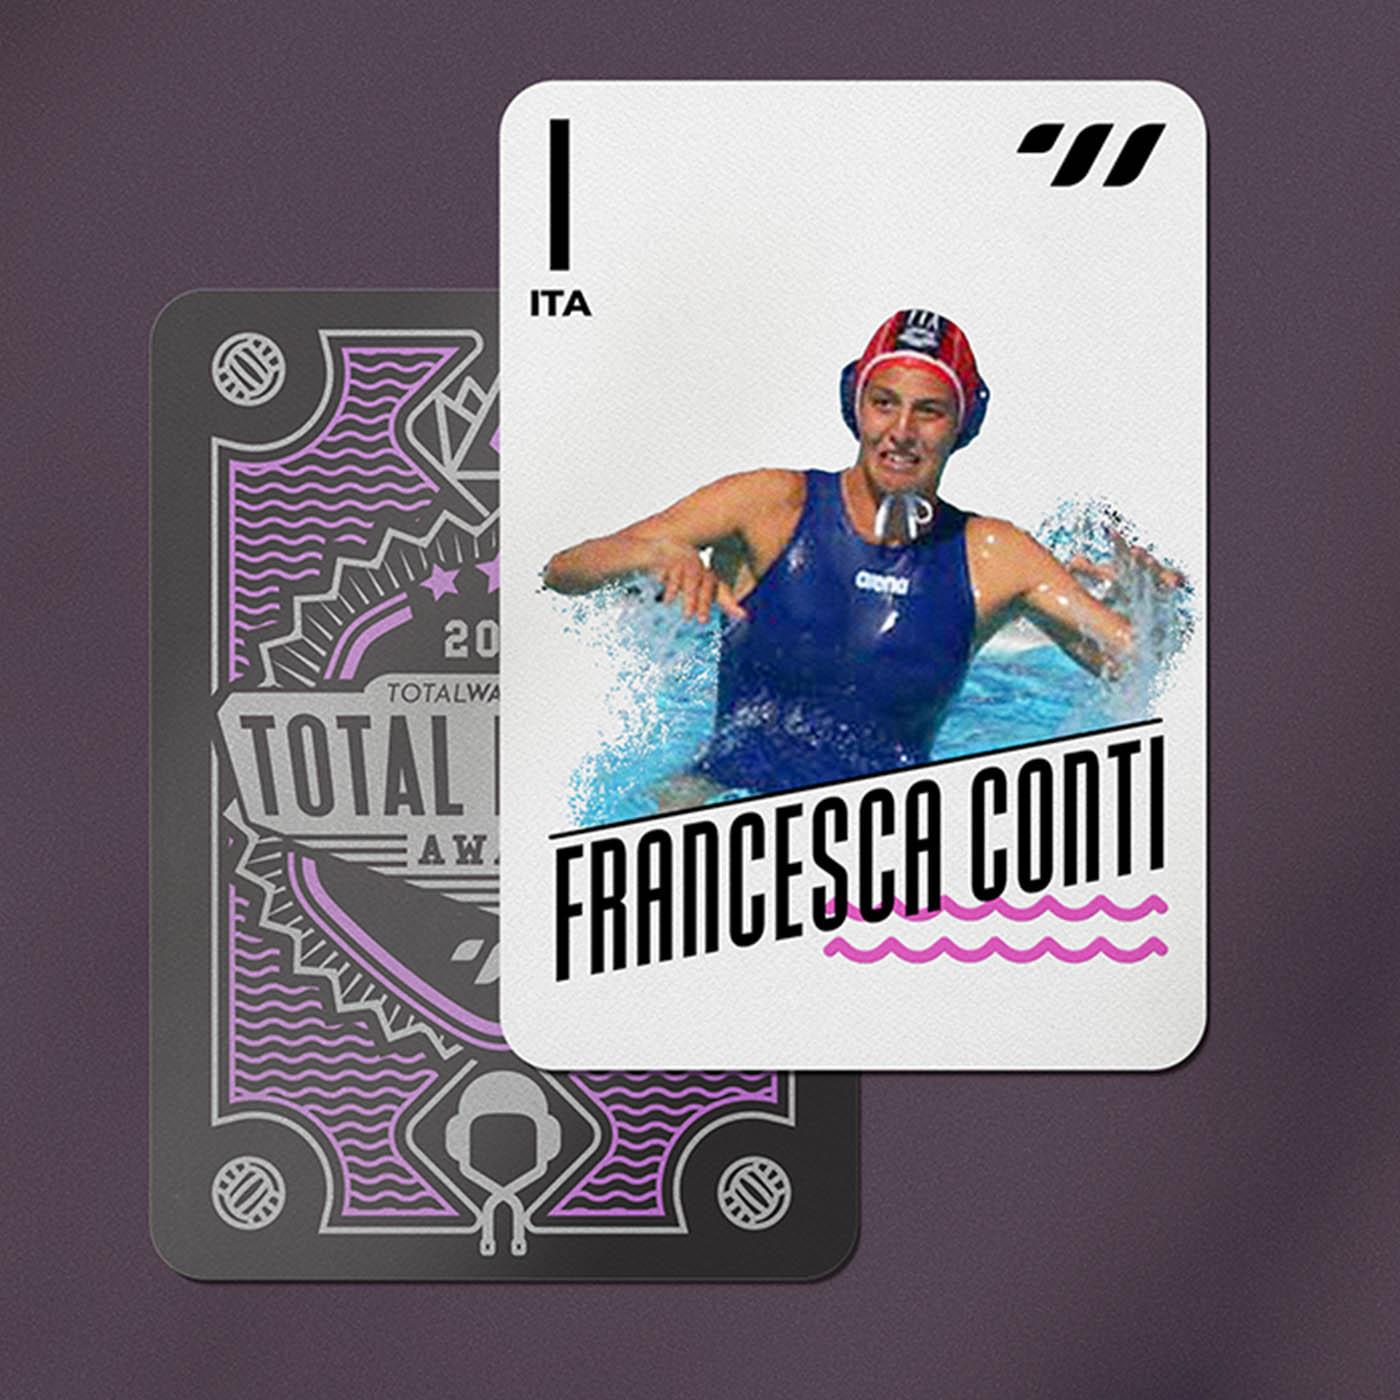 GOALKEEPER - Francesca Conti (ITA)